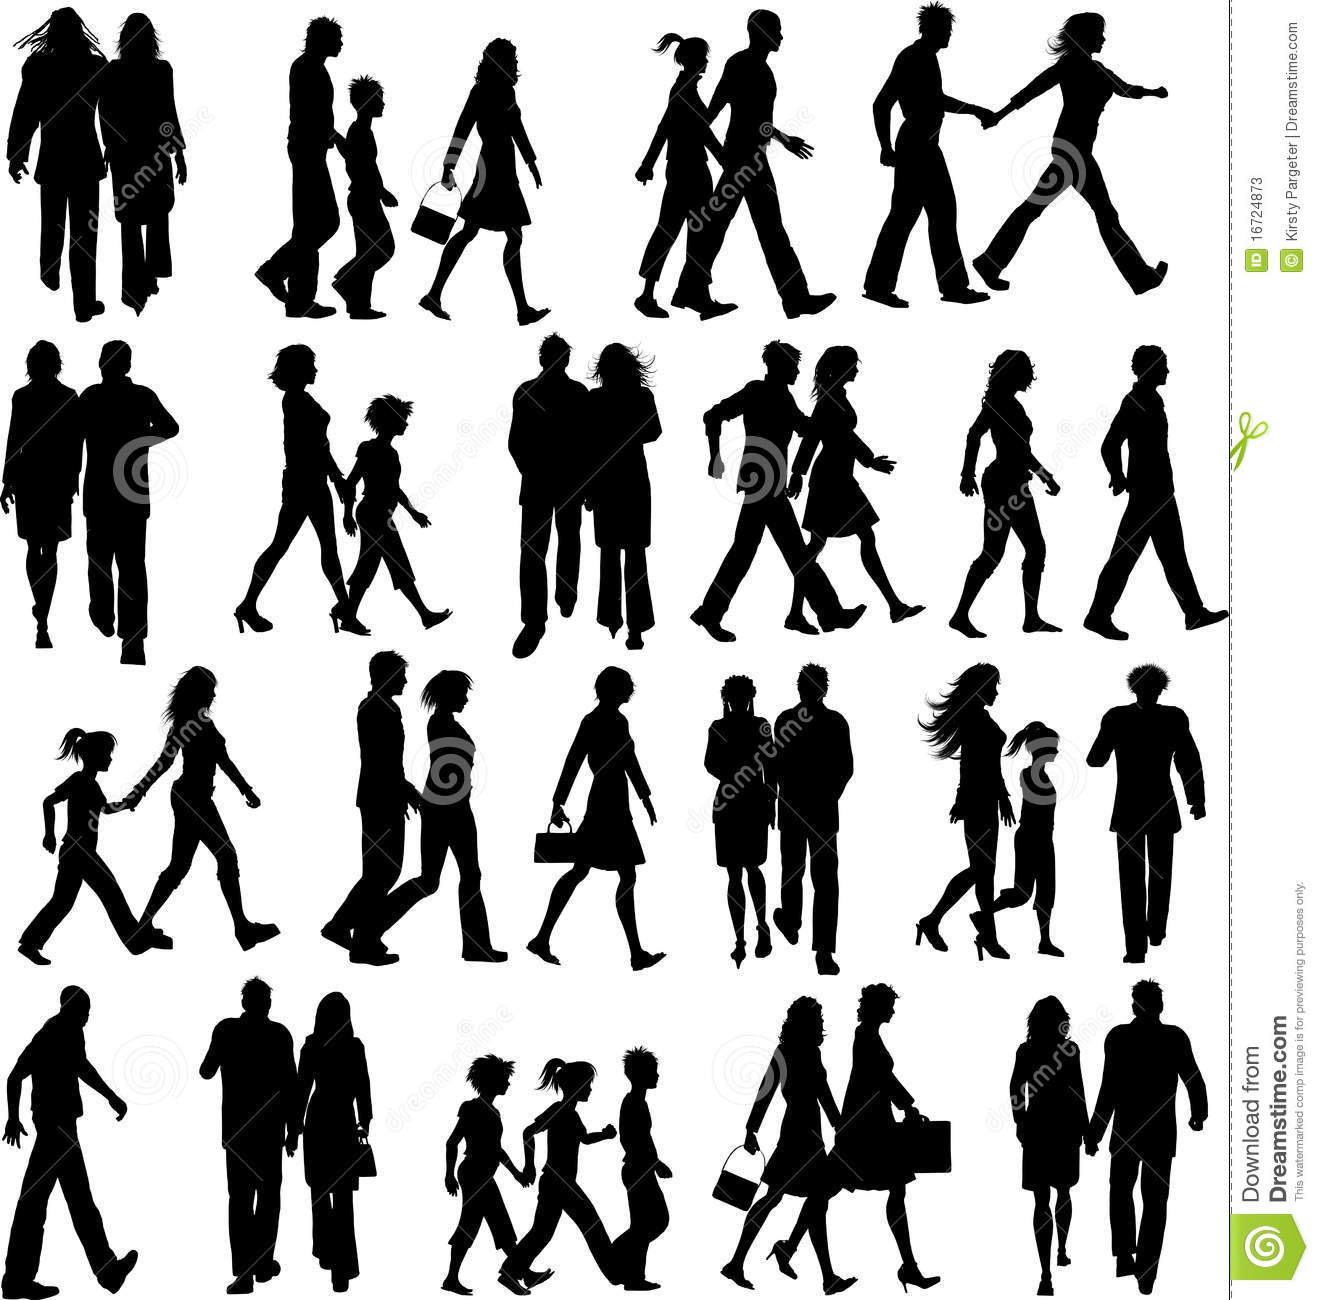 Walk Together Clipart.